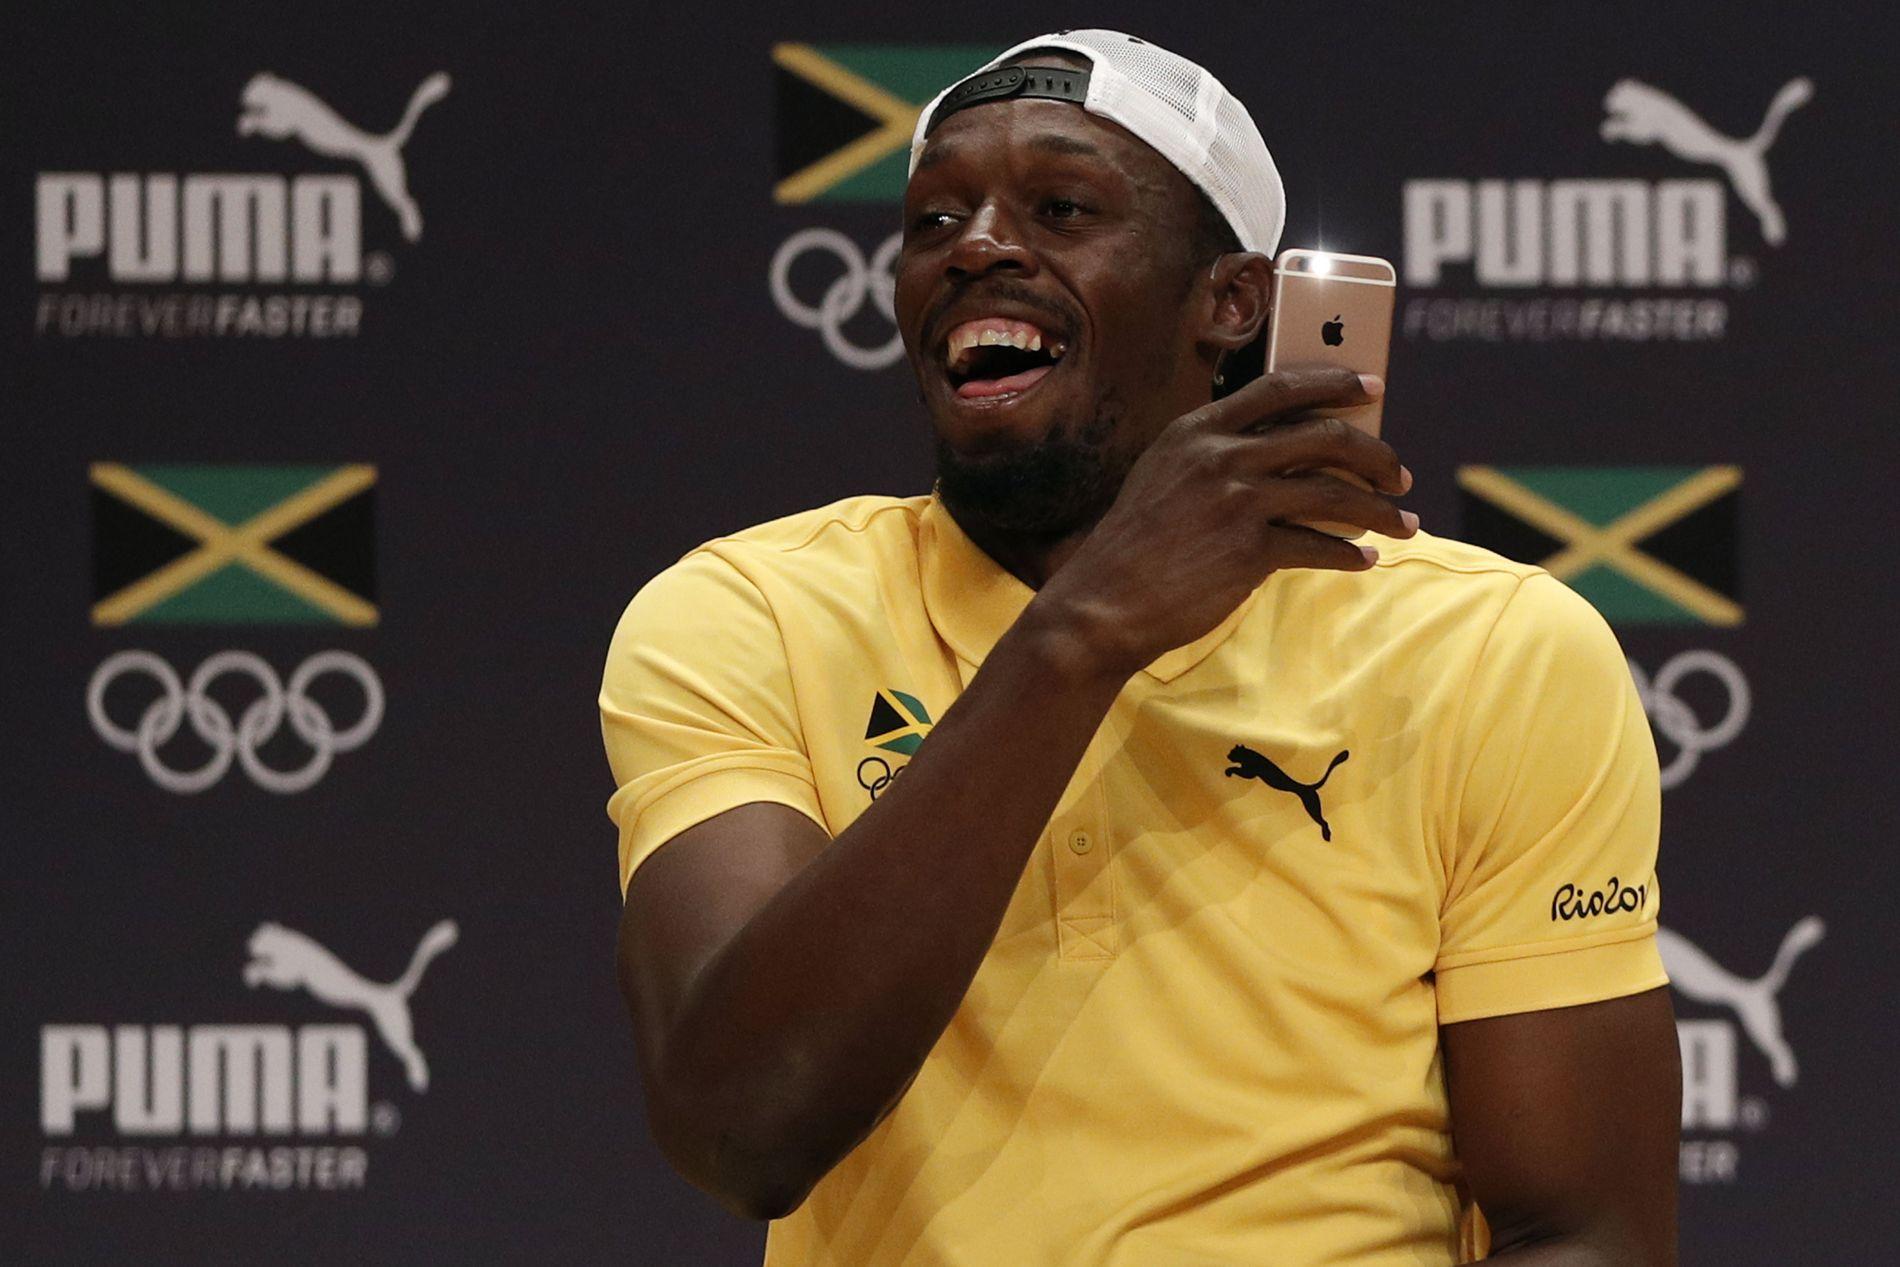 f1b14dda FILMET RAMM-SANG: Her filmer Usain Bolt reggae-sangen til Nicolay Ramm.  Foto: Adrian Dennis AFP